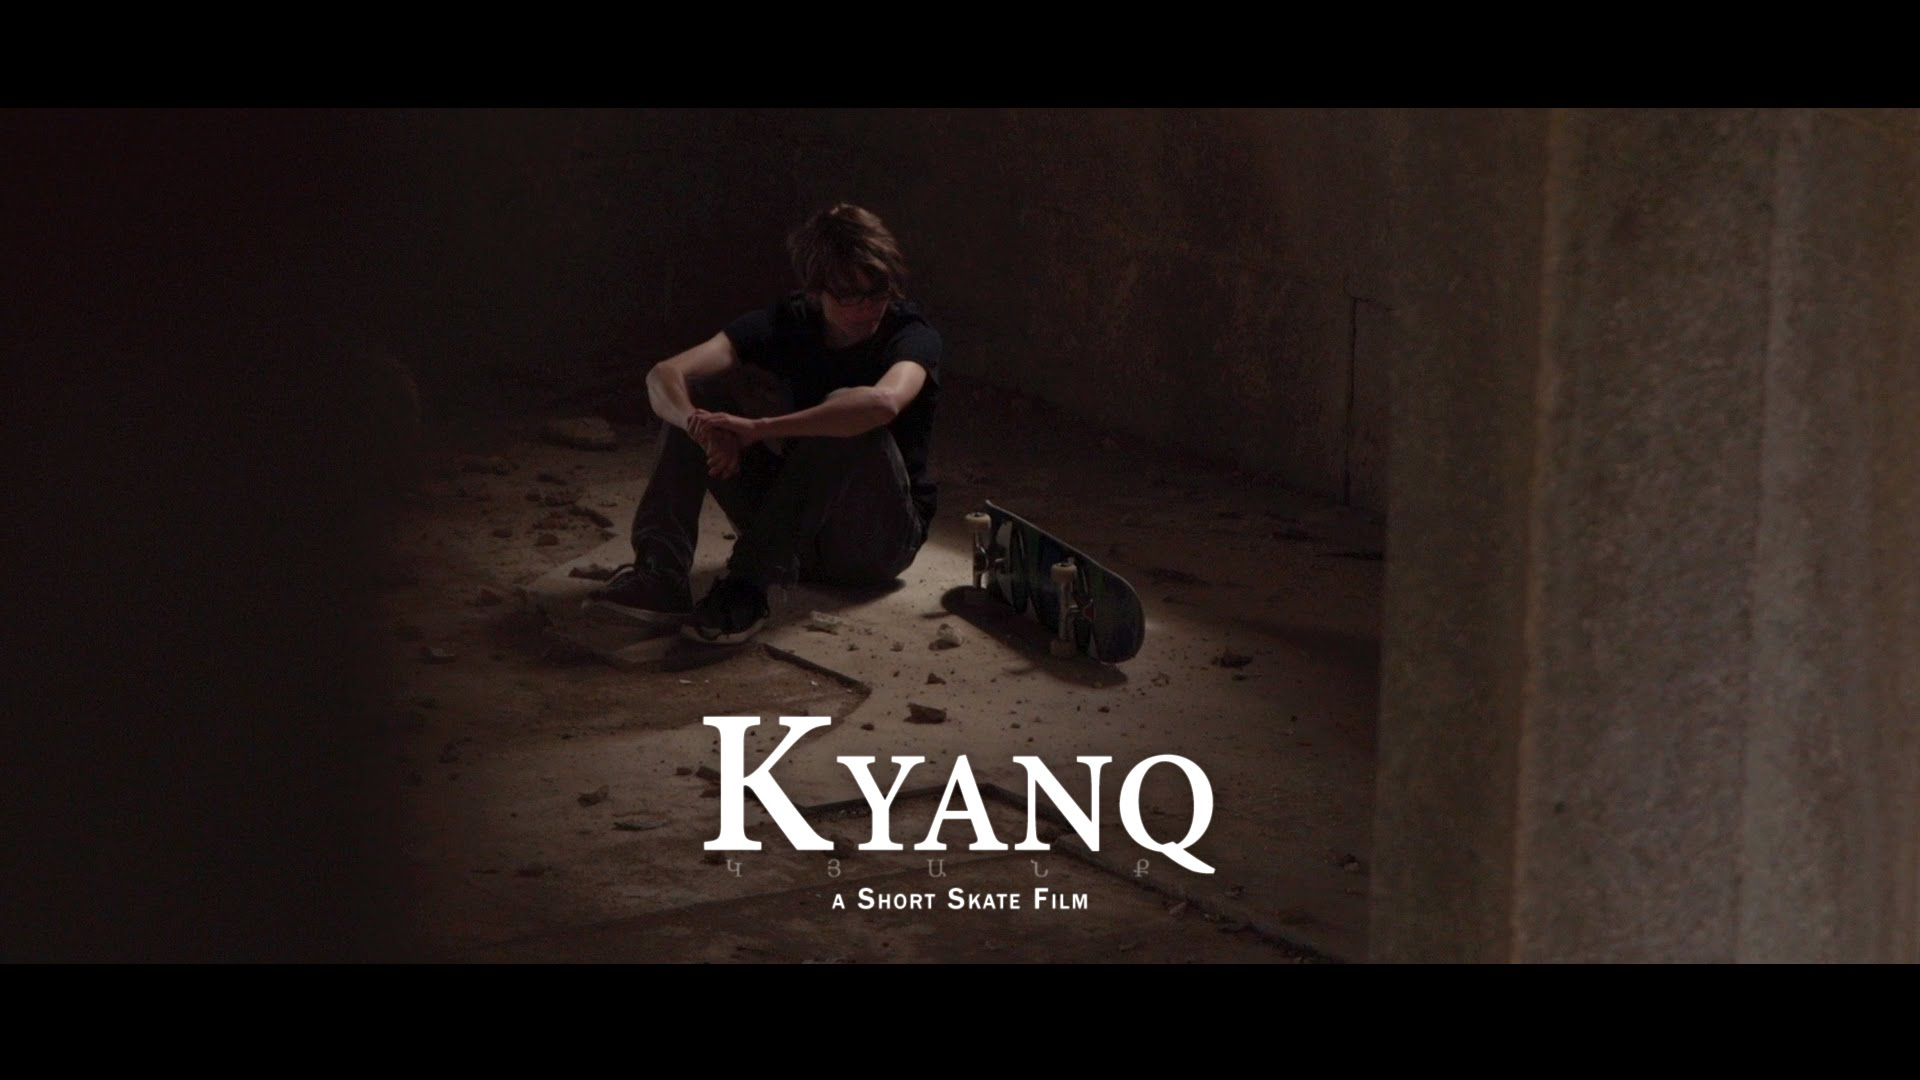 Kyanq: a Short Skate Film.